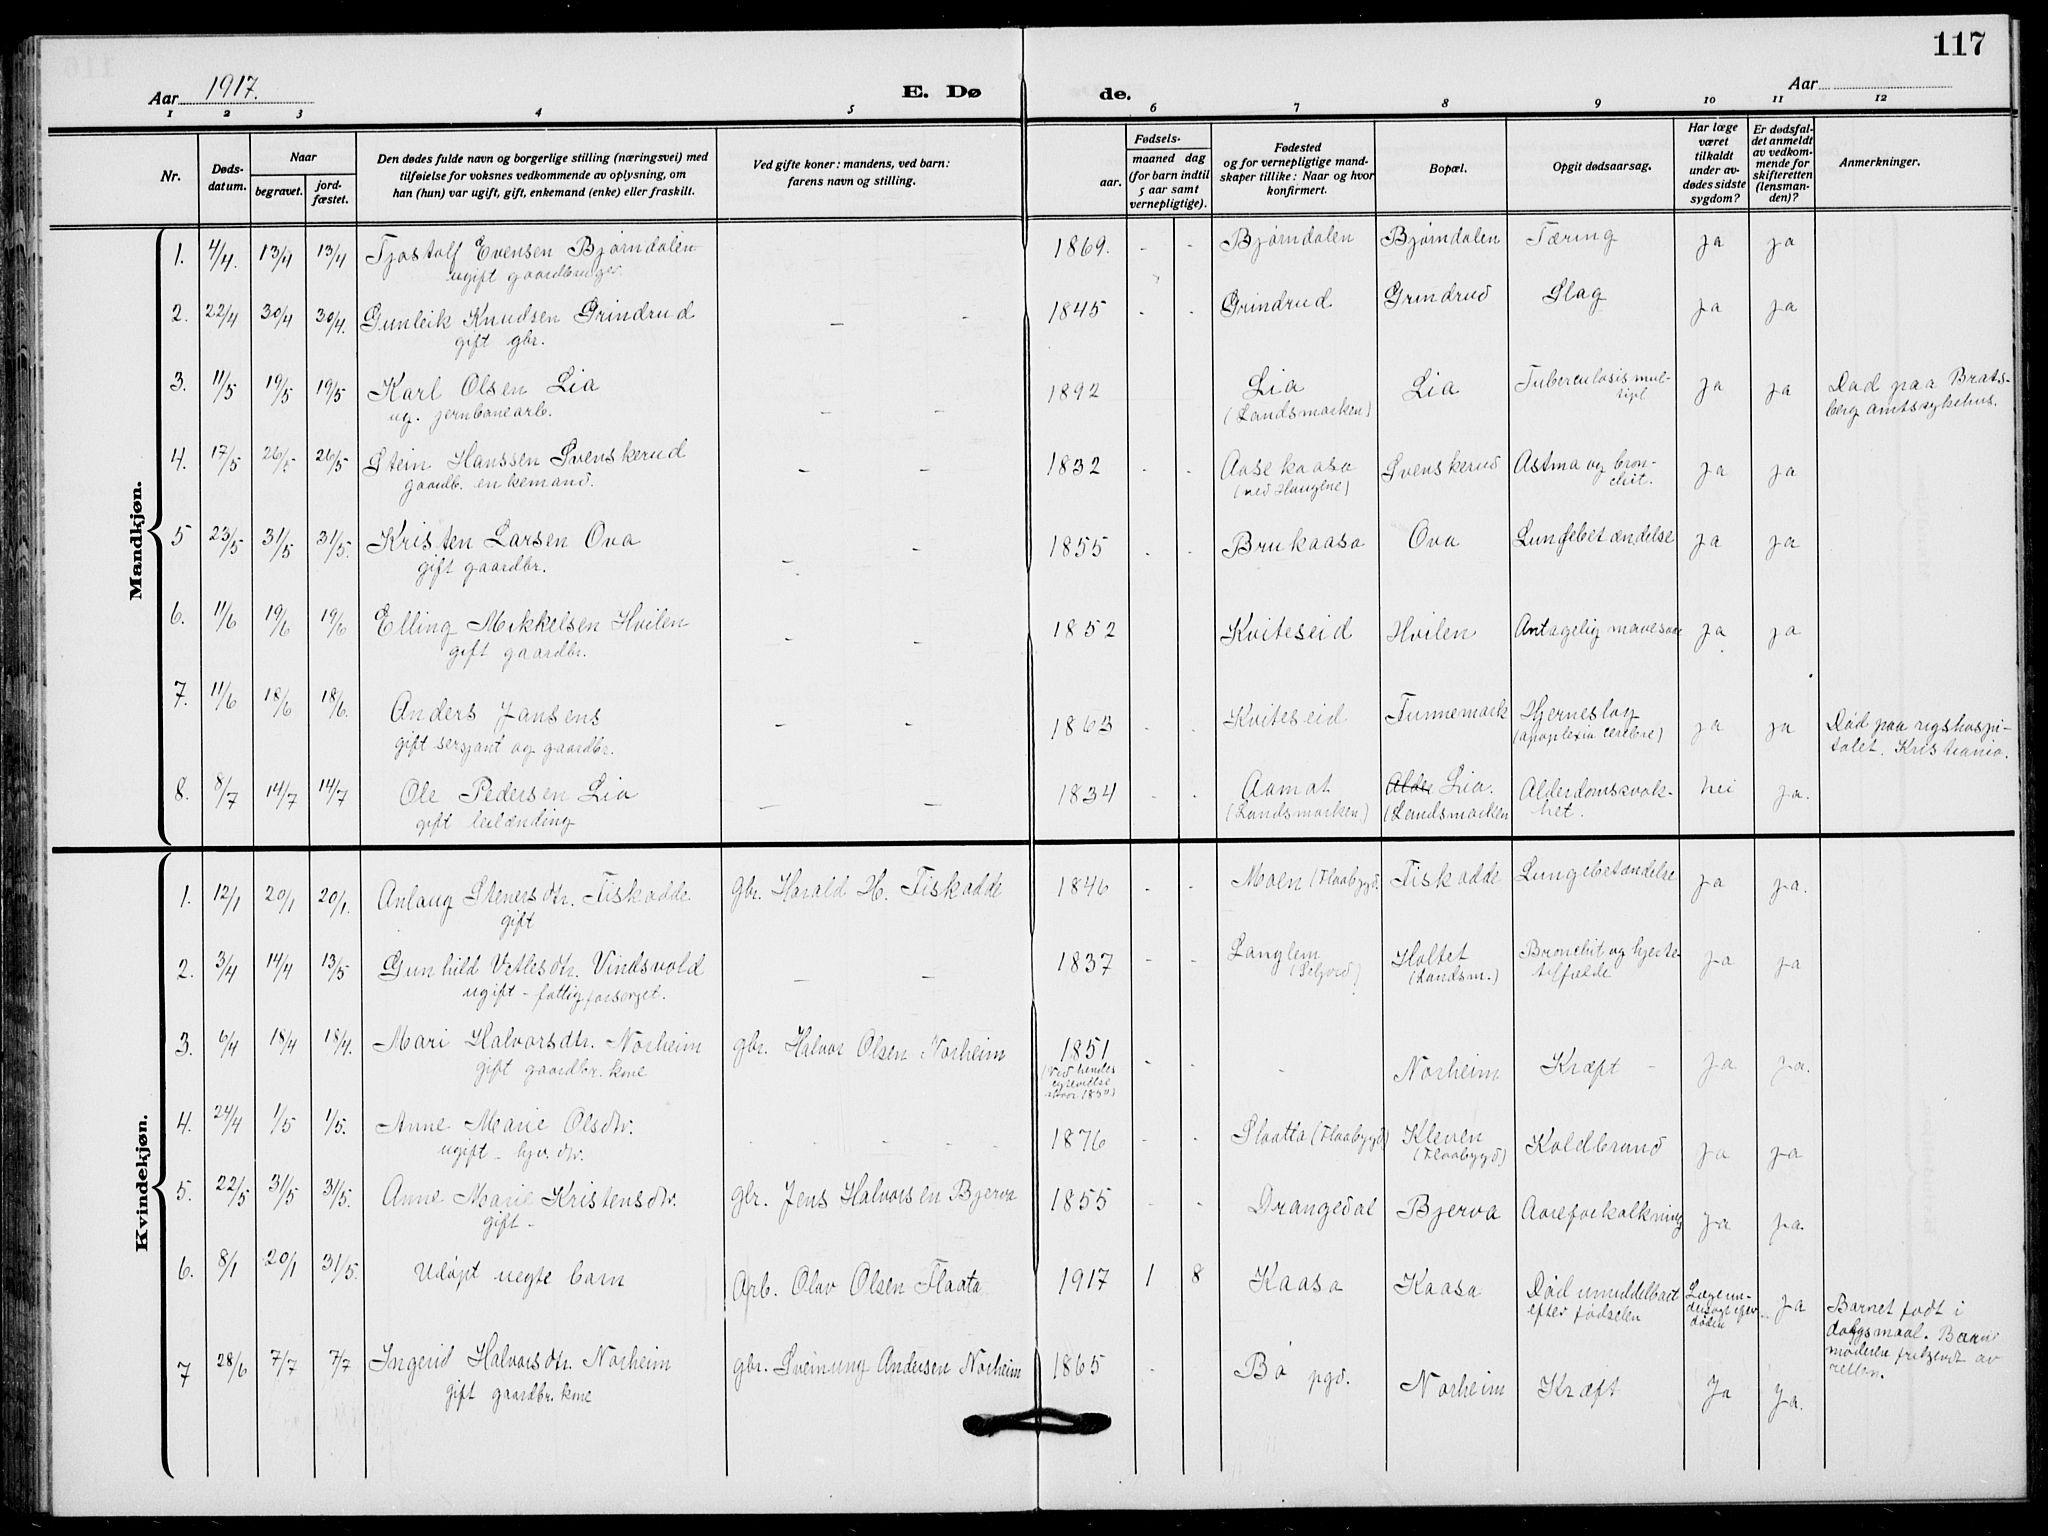 SAKO, Lunde kirkebøker, F/Fa/L0005: Ministerialbok nr. I 5, 1914-1922, s. 117